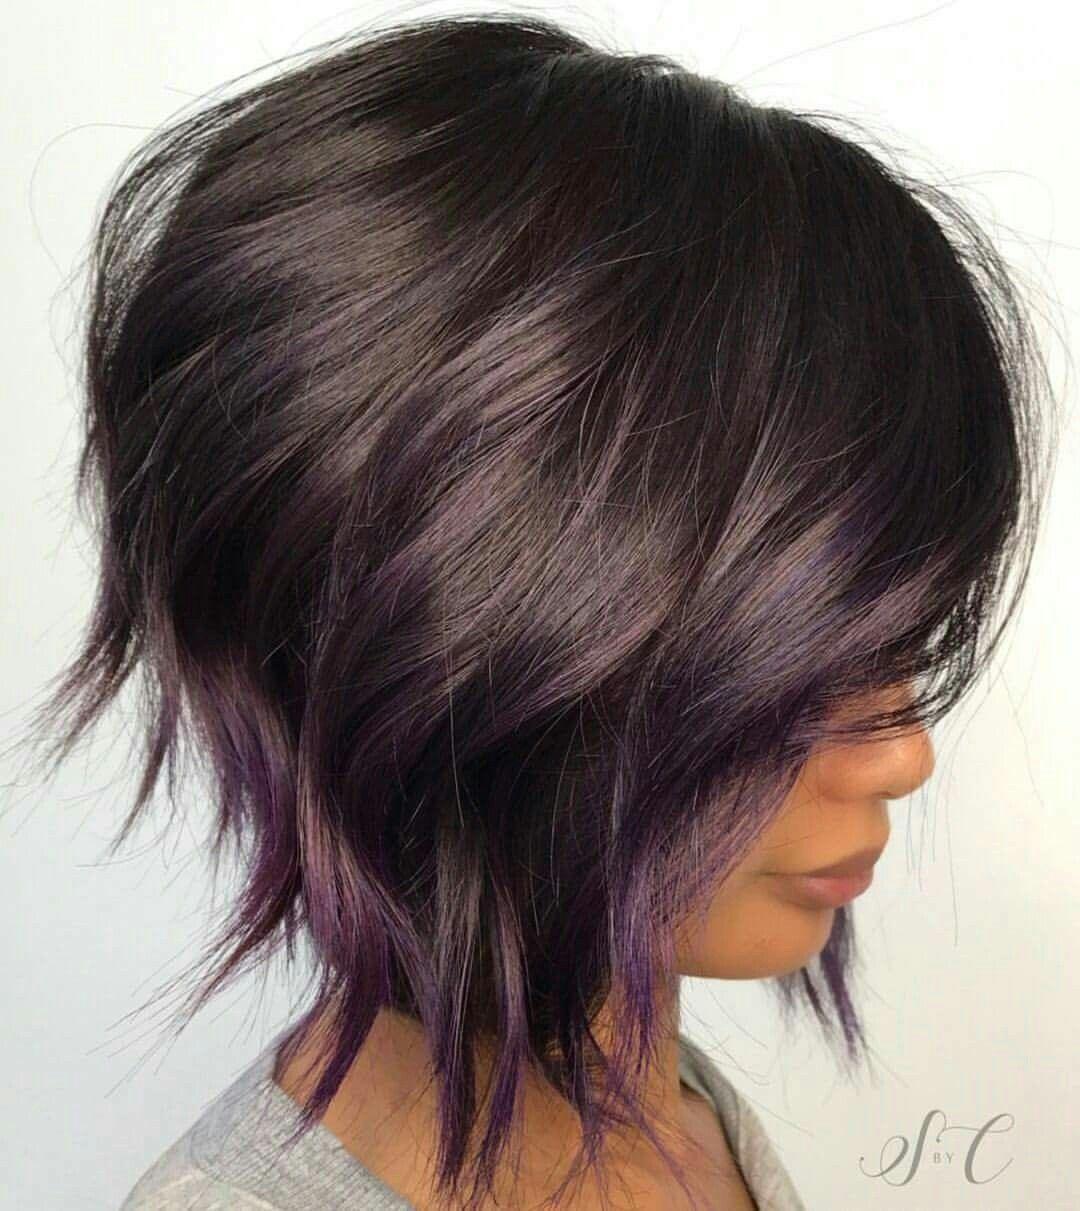 Martakarvatska hair pinterest hair style haircuts and hair cuts